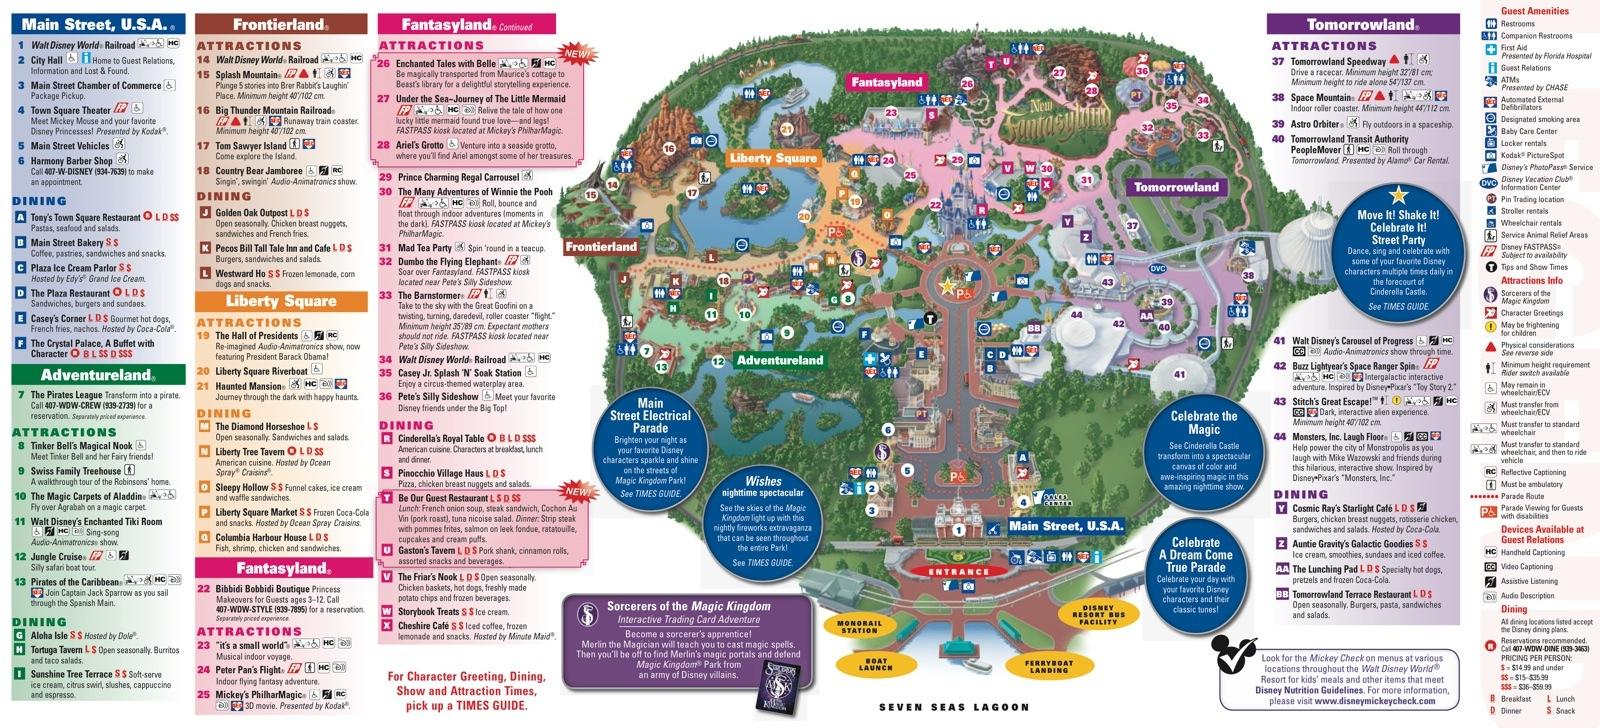 Printable Disney World Animal Kingdom Map Google Map Disney World - Printable Disney Maps